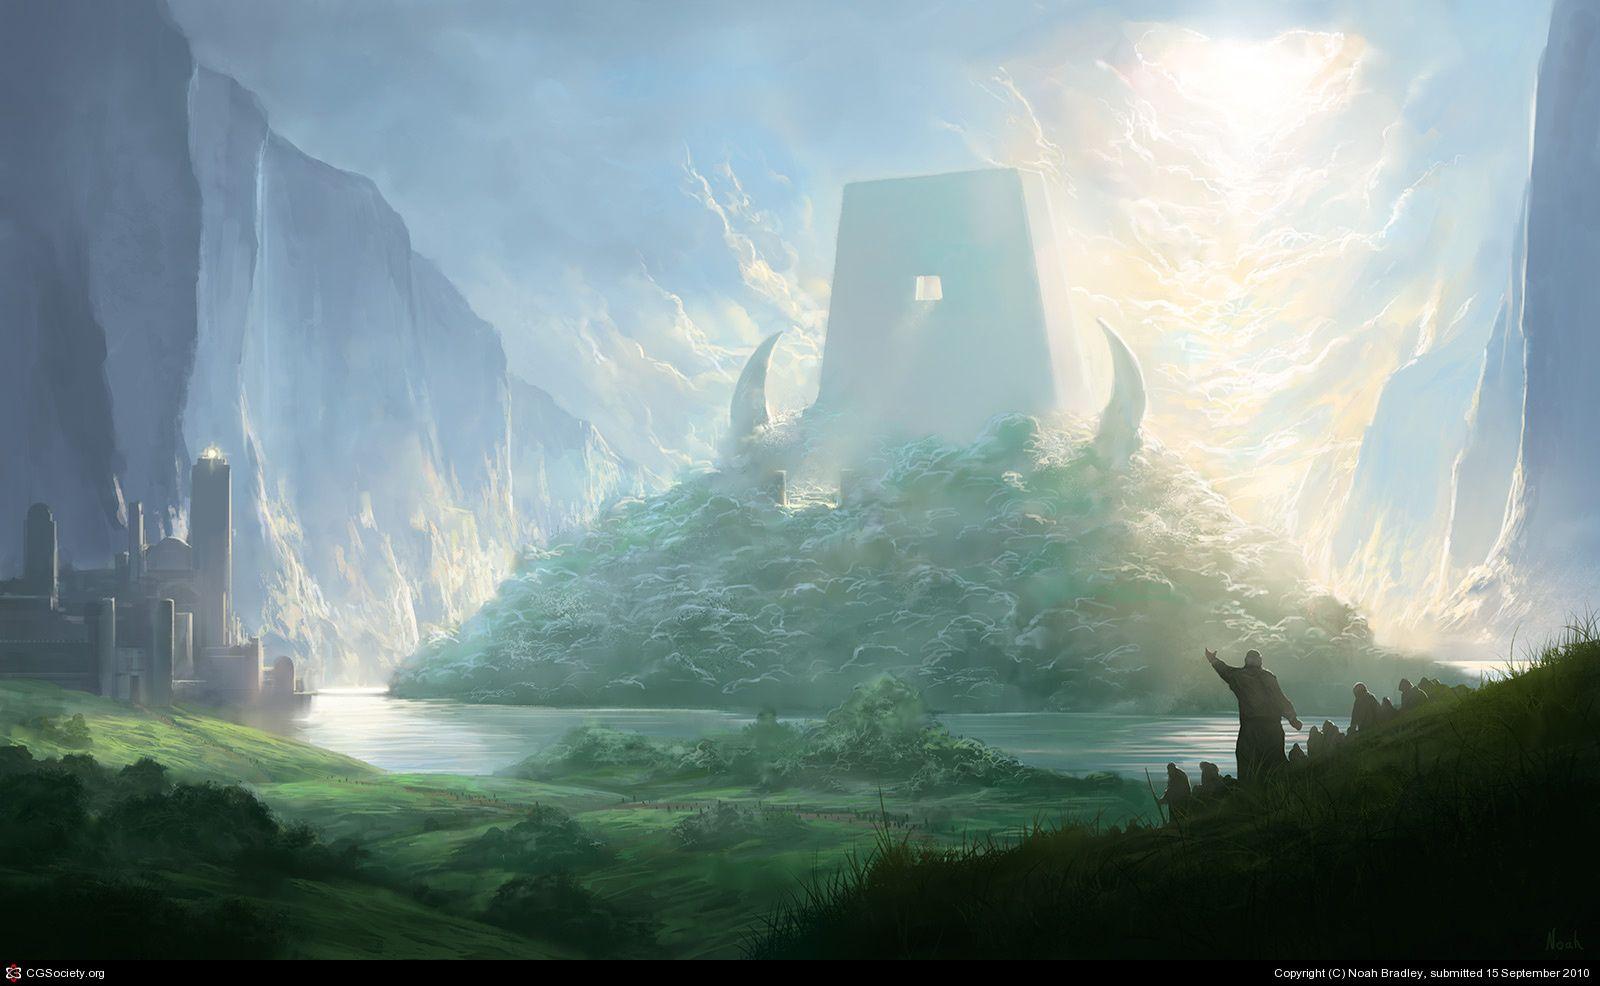 The End of Sorrow by Noah Bradley | 2D | CGSociety